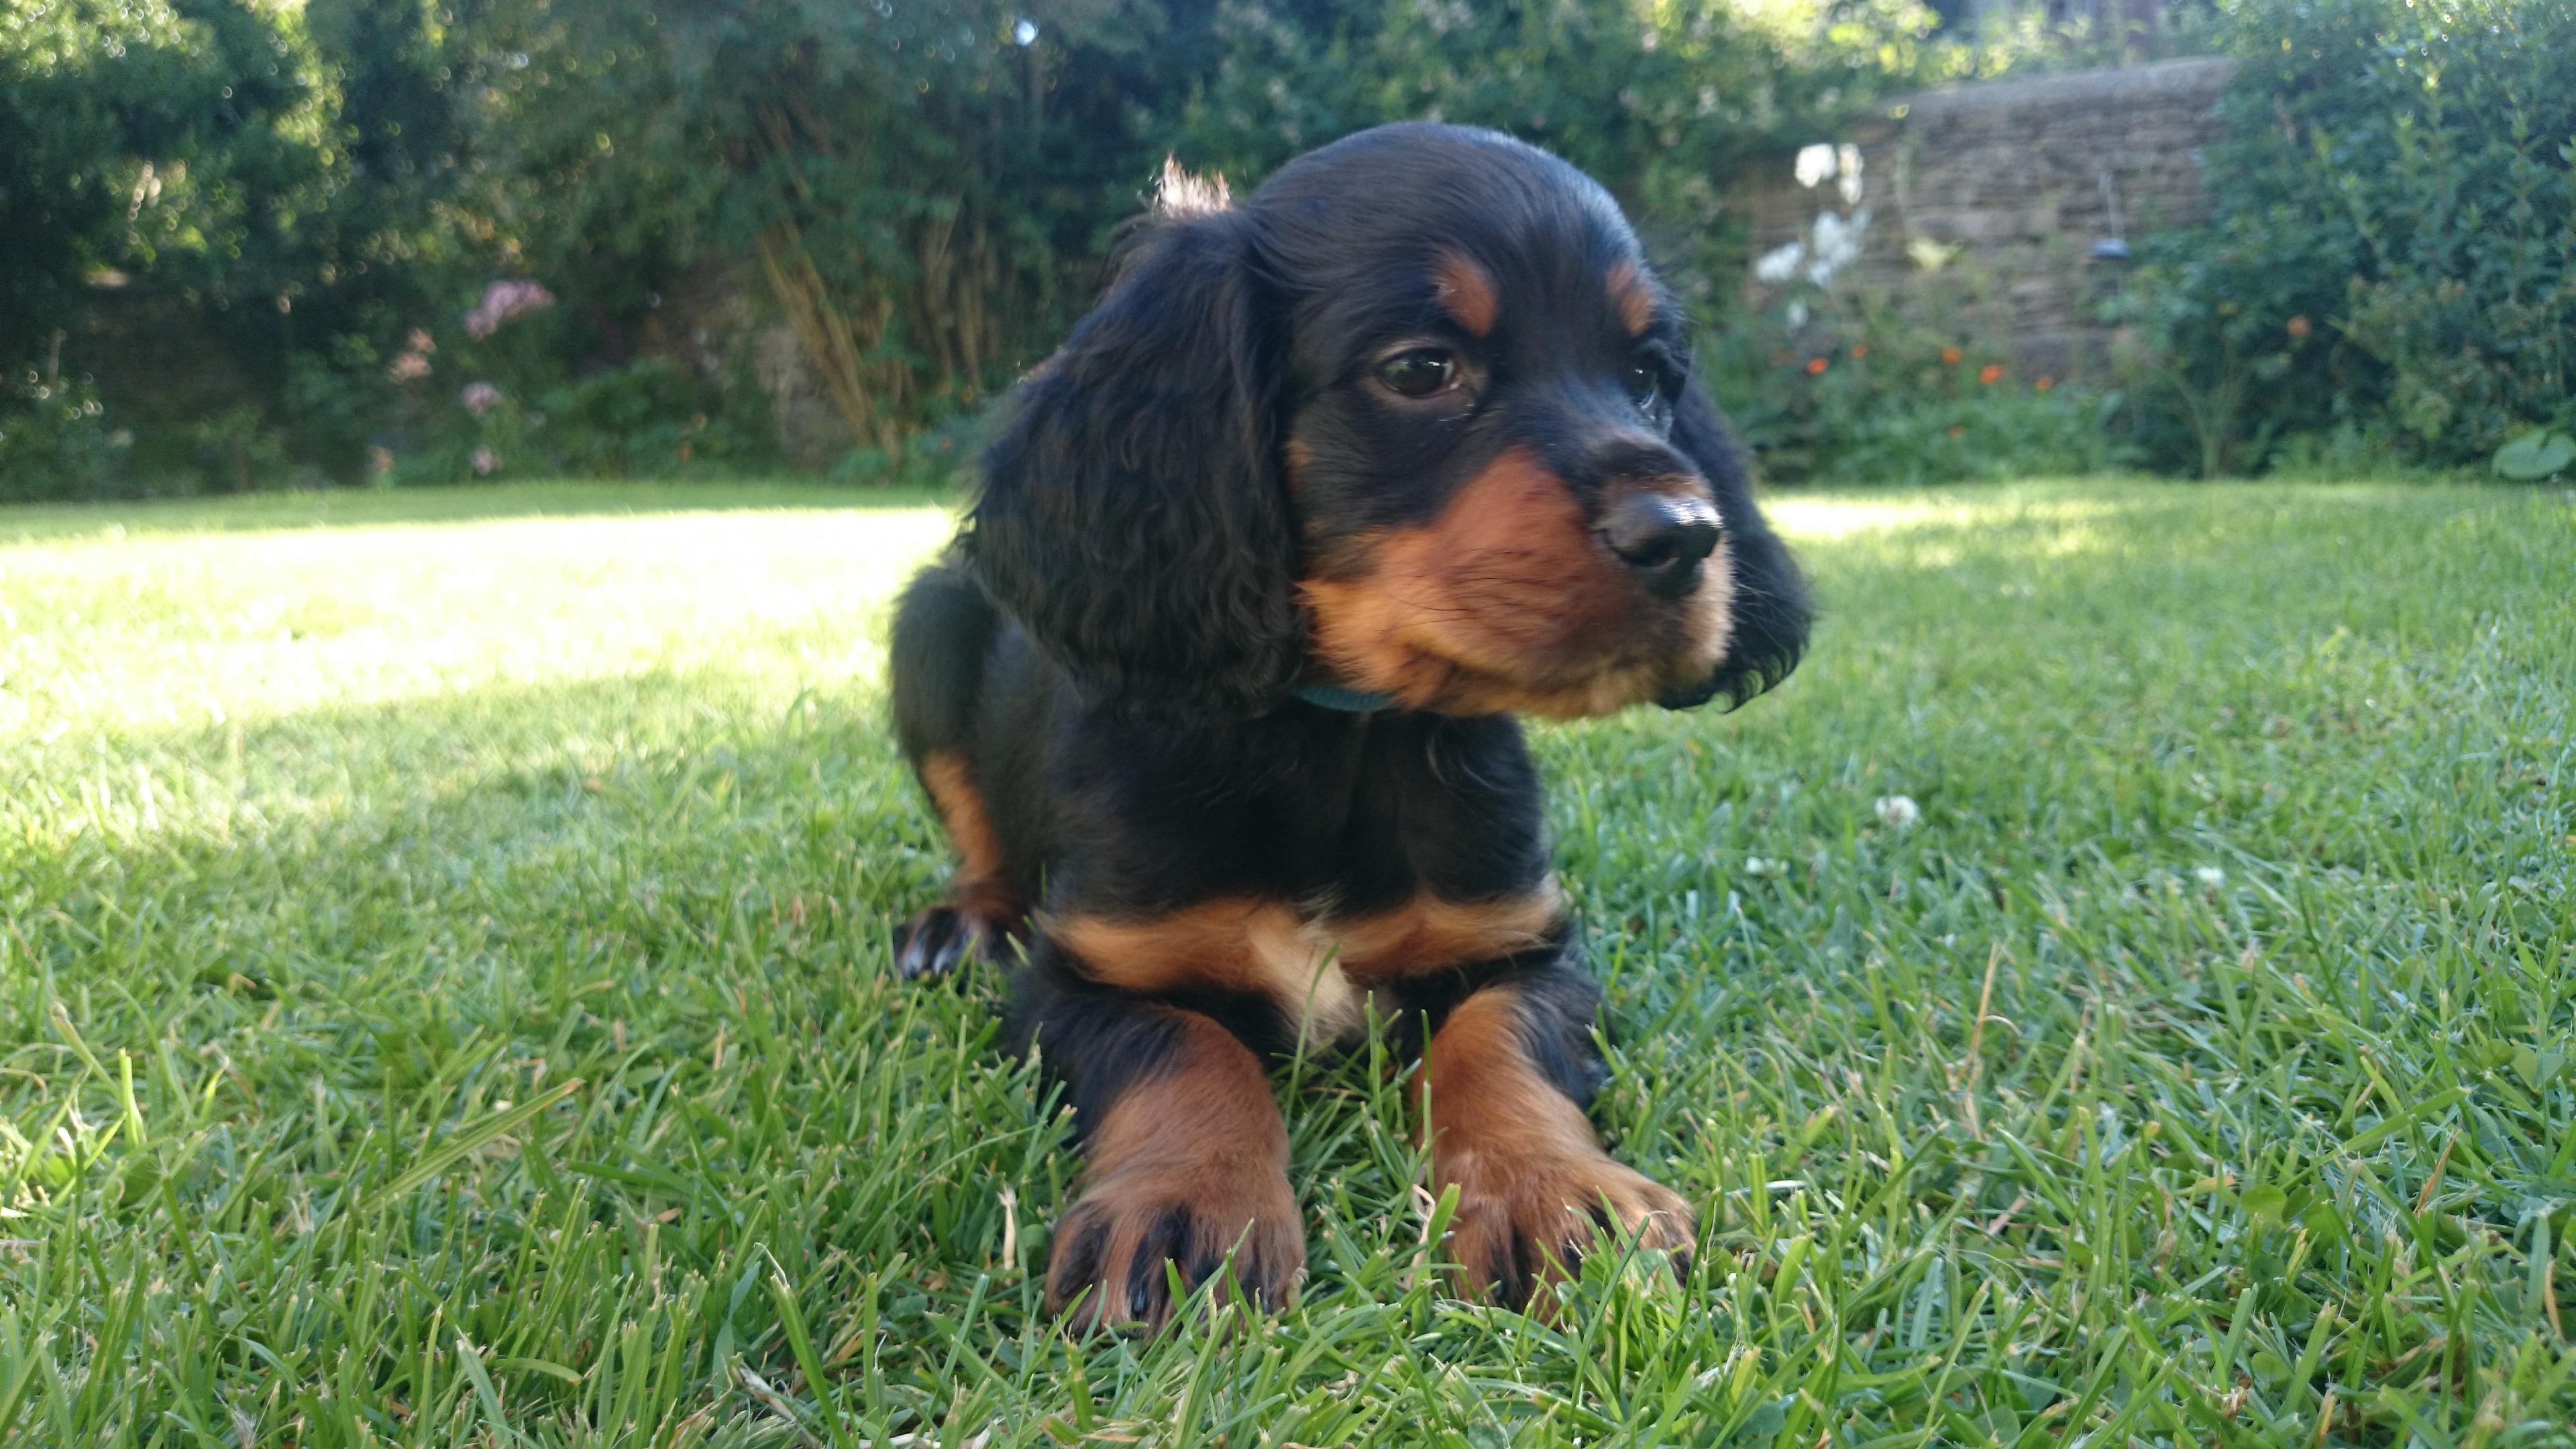 Monty at 12 Weeks